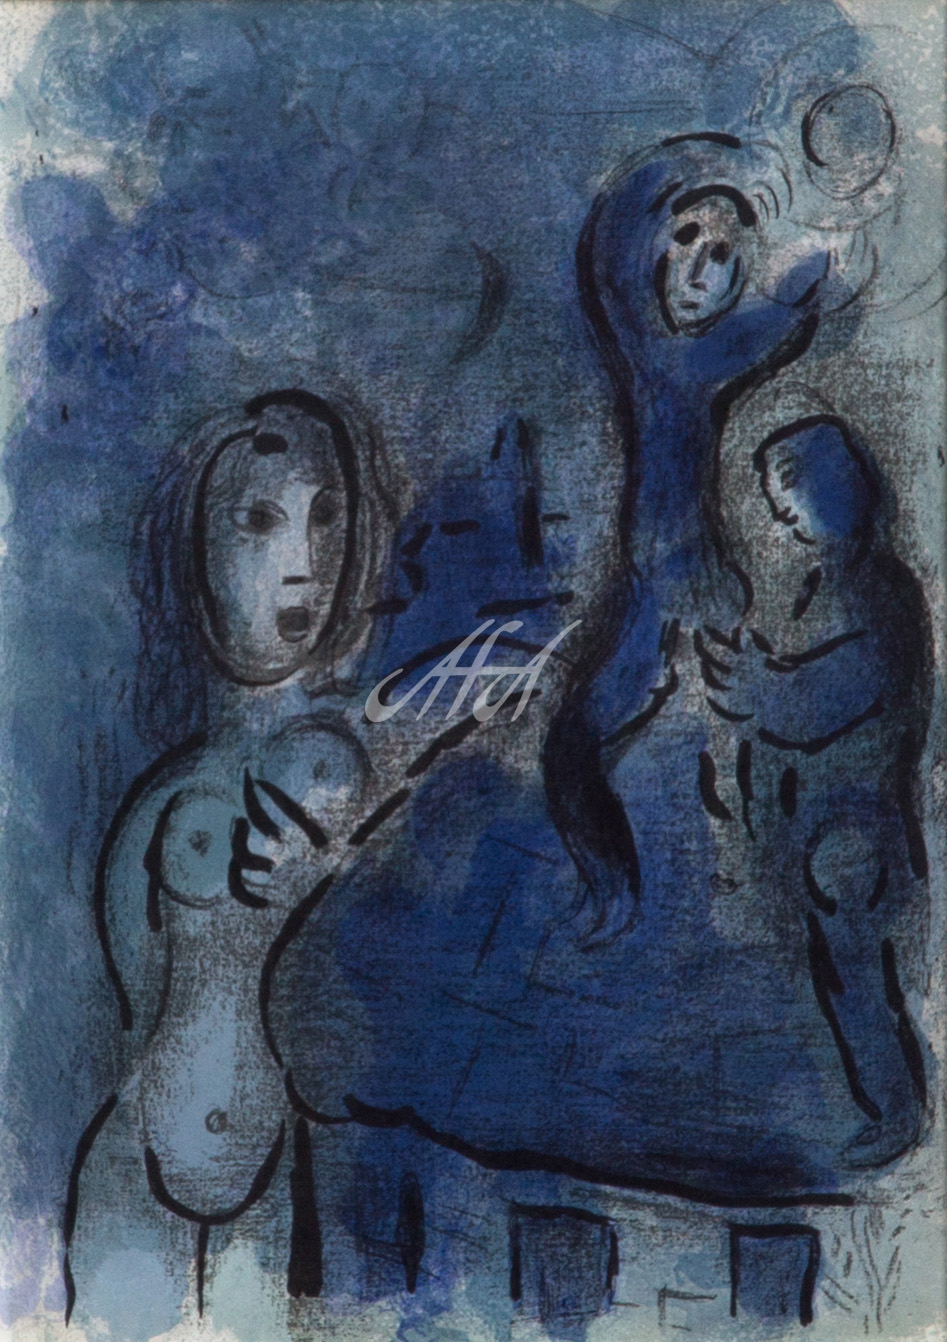 Marc_Chagall_figurative7 LoRes watermark.jpg